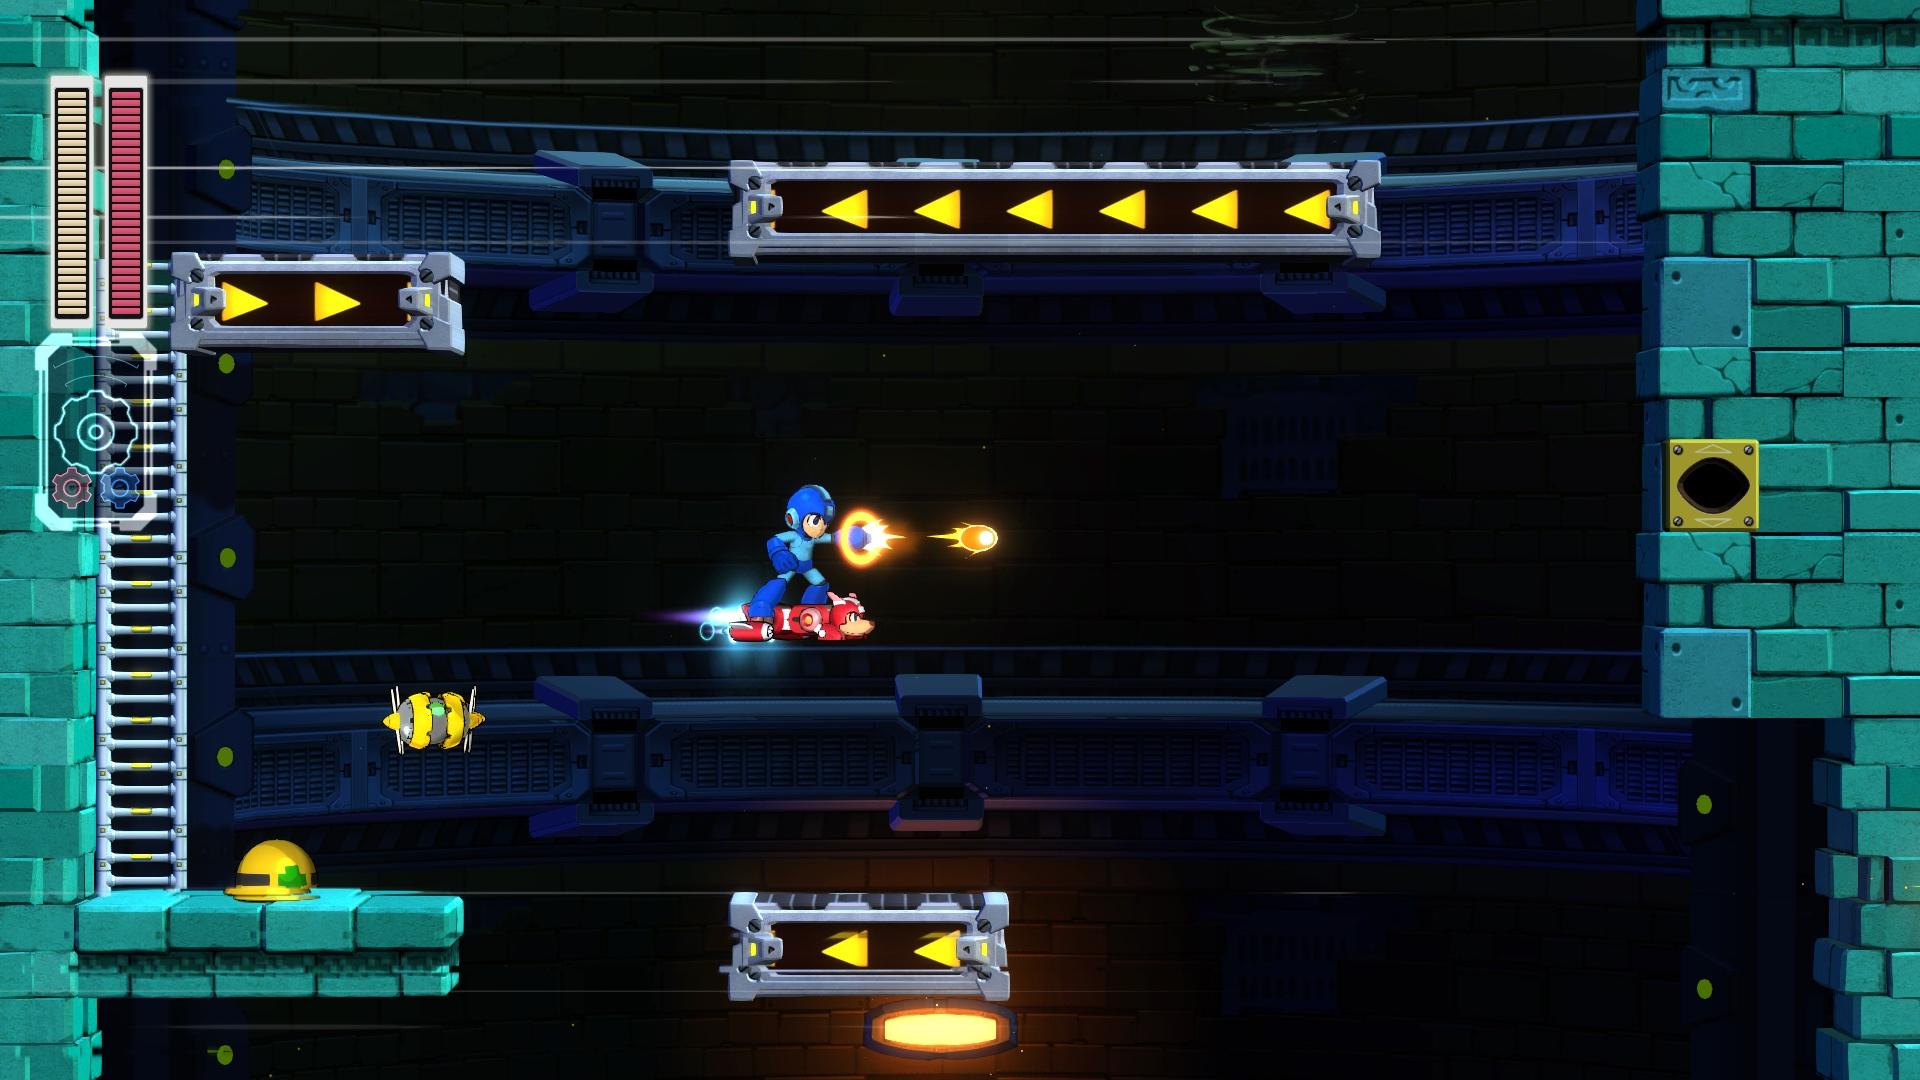 Mega Man 11 Announced For 2018 Release Polygon